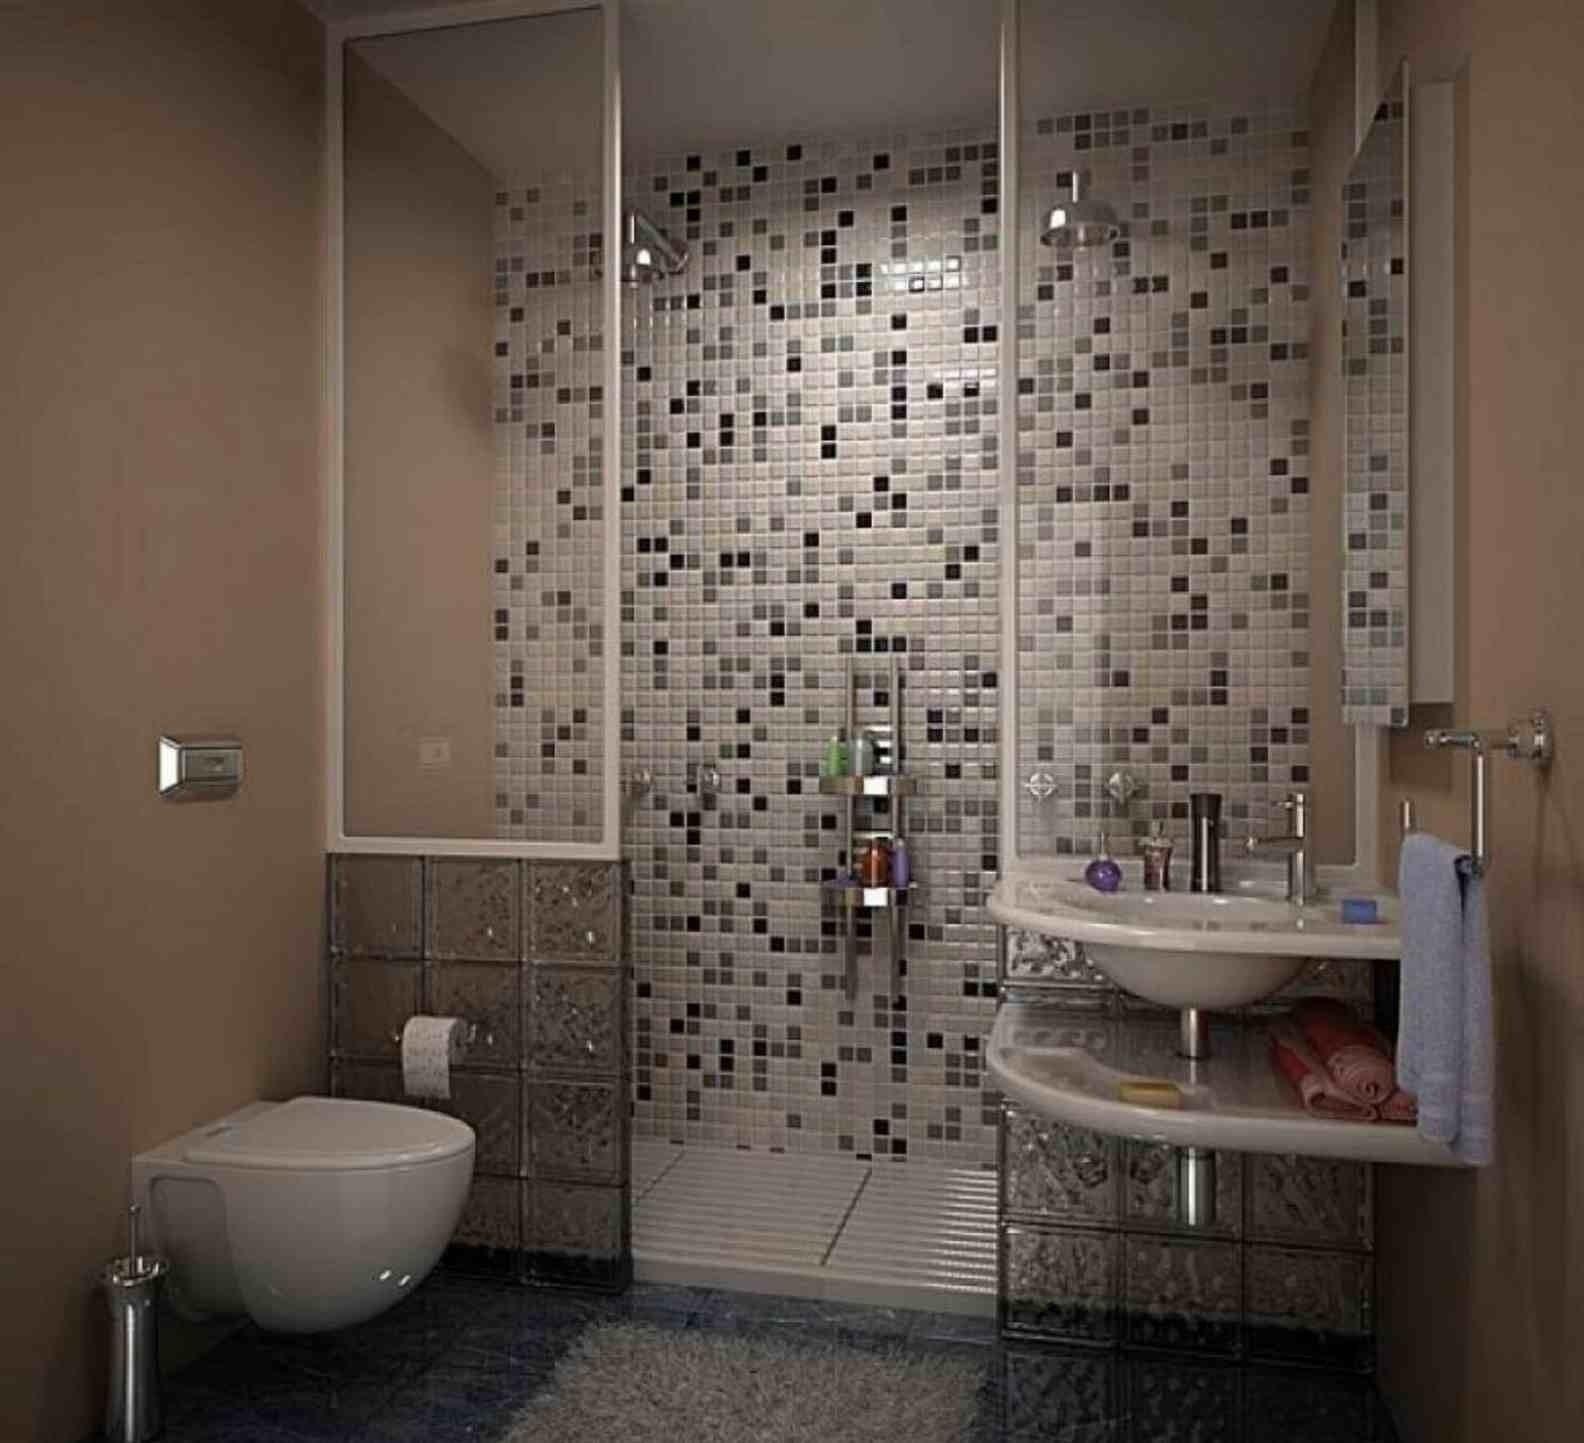 10 Unique Tile Ideas For Small Bathroom nice tile ideas for small bathrooms tile ideas for small bathrooms 2020